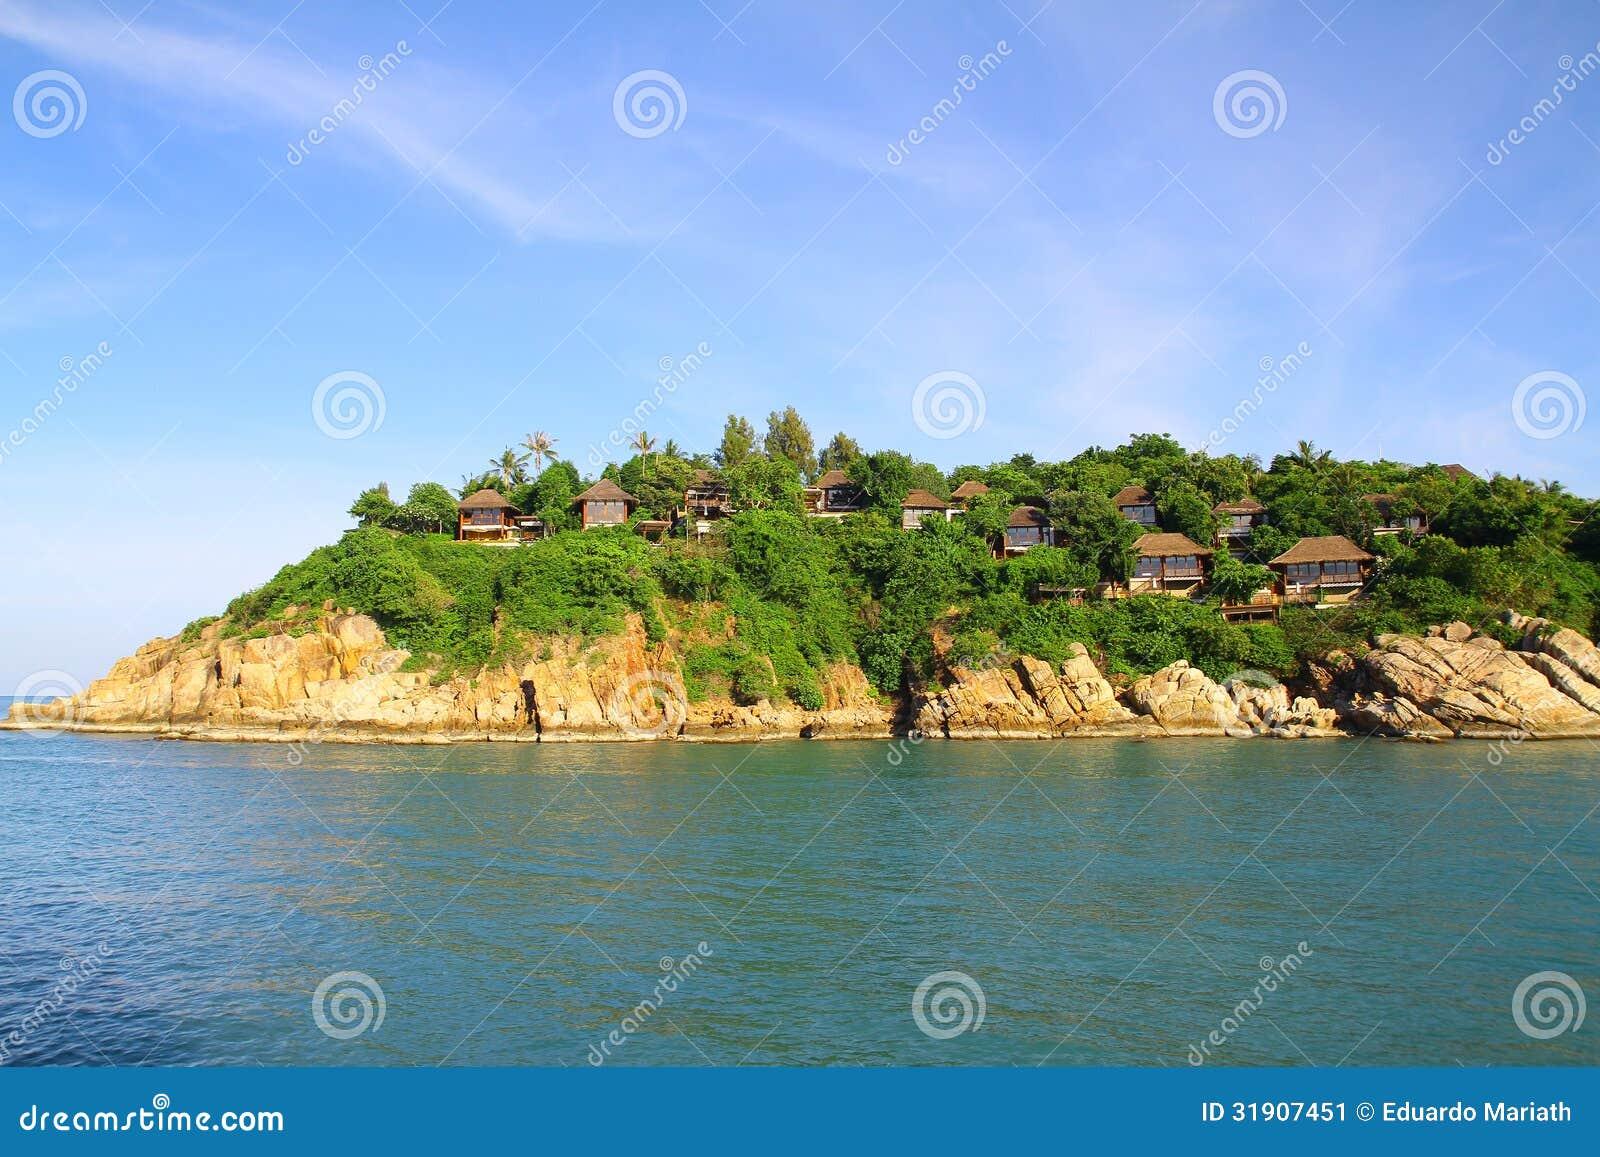 Luxury villas in koh samui thailand stock image image for Luxury retreats koh samui